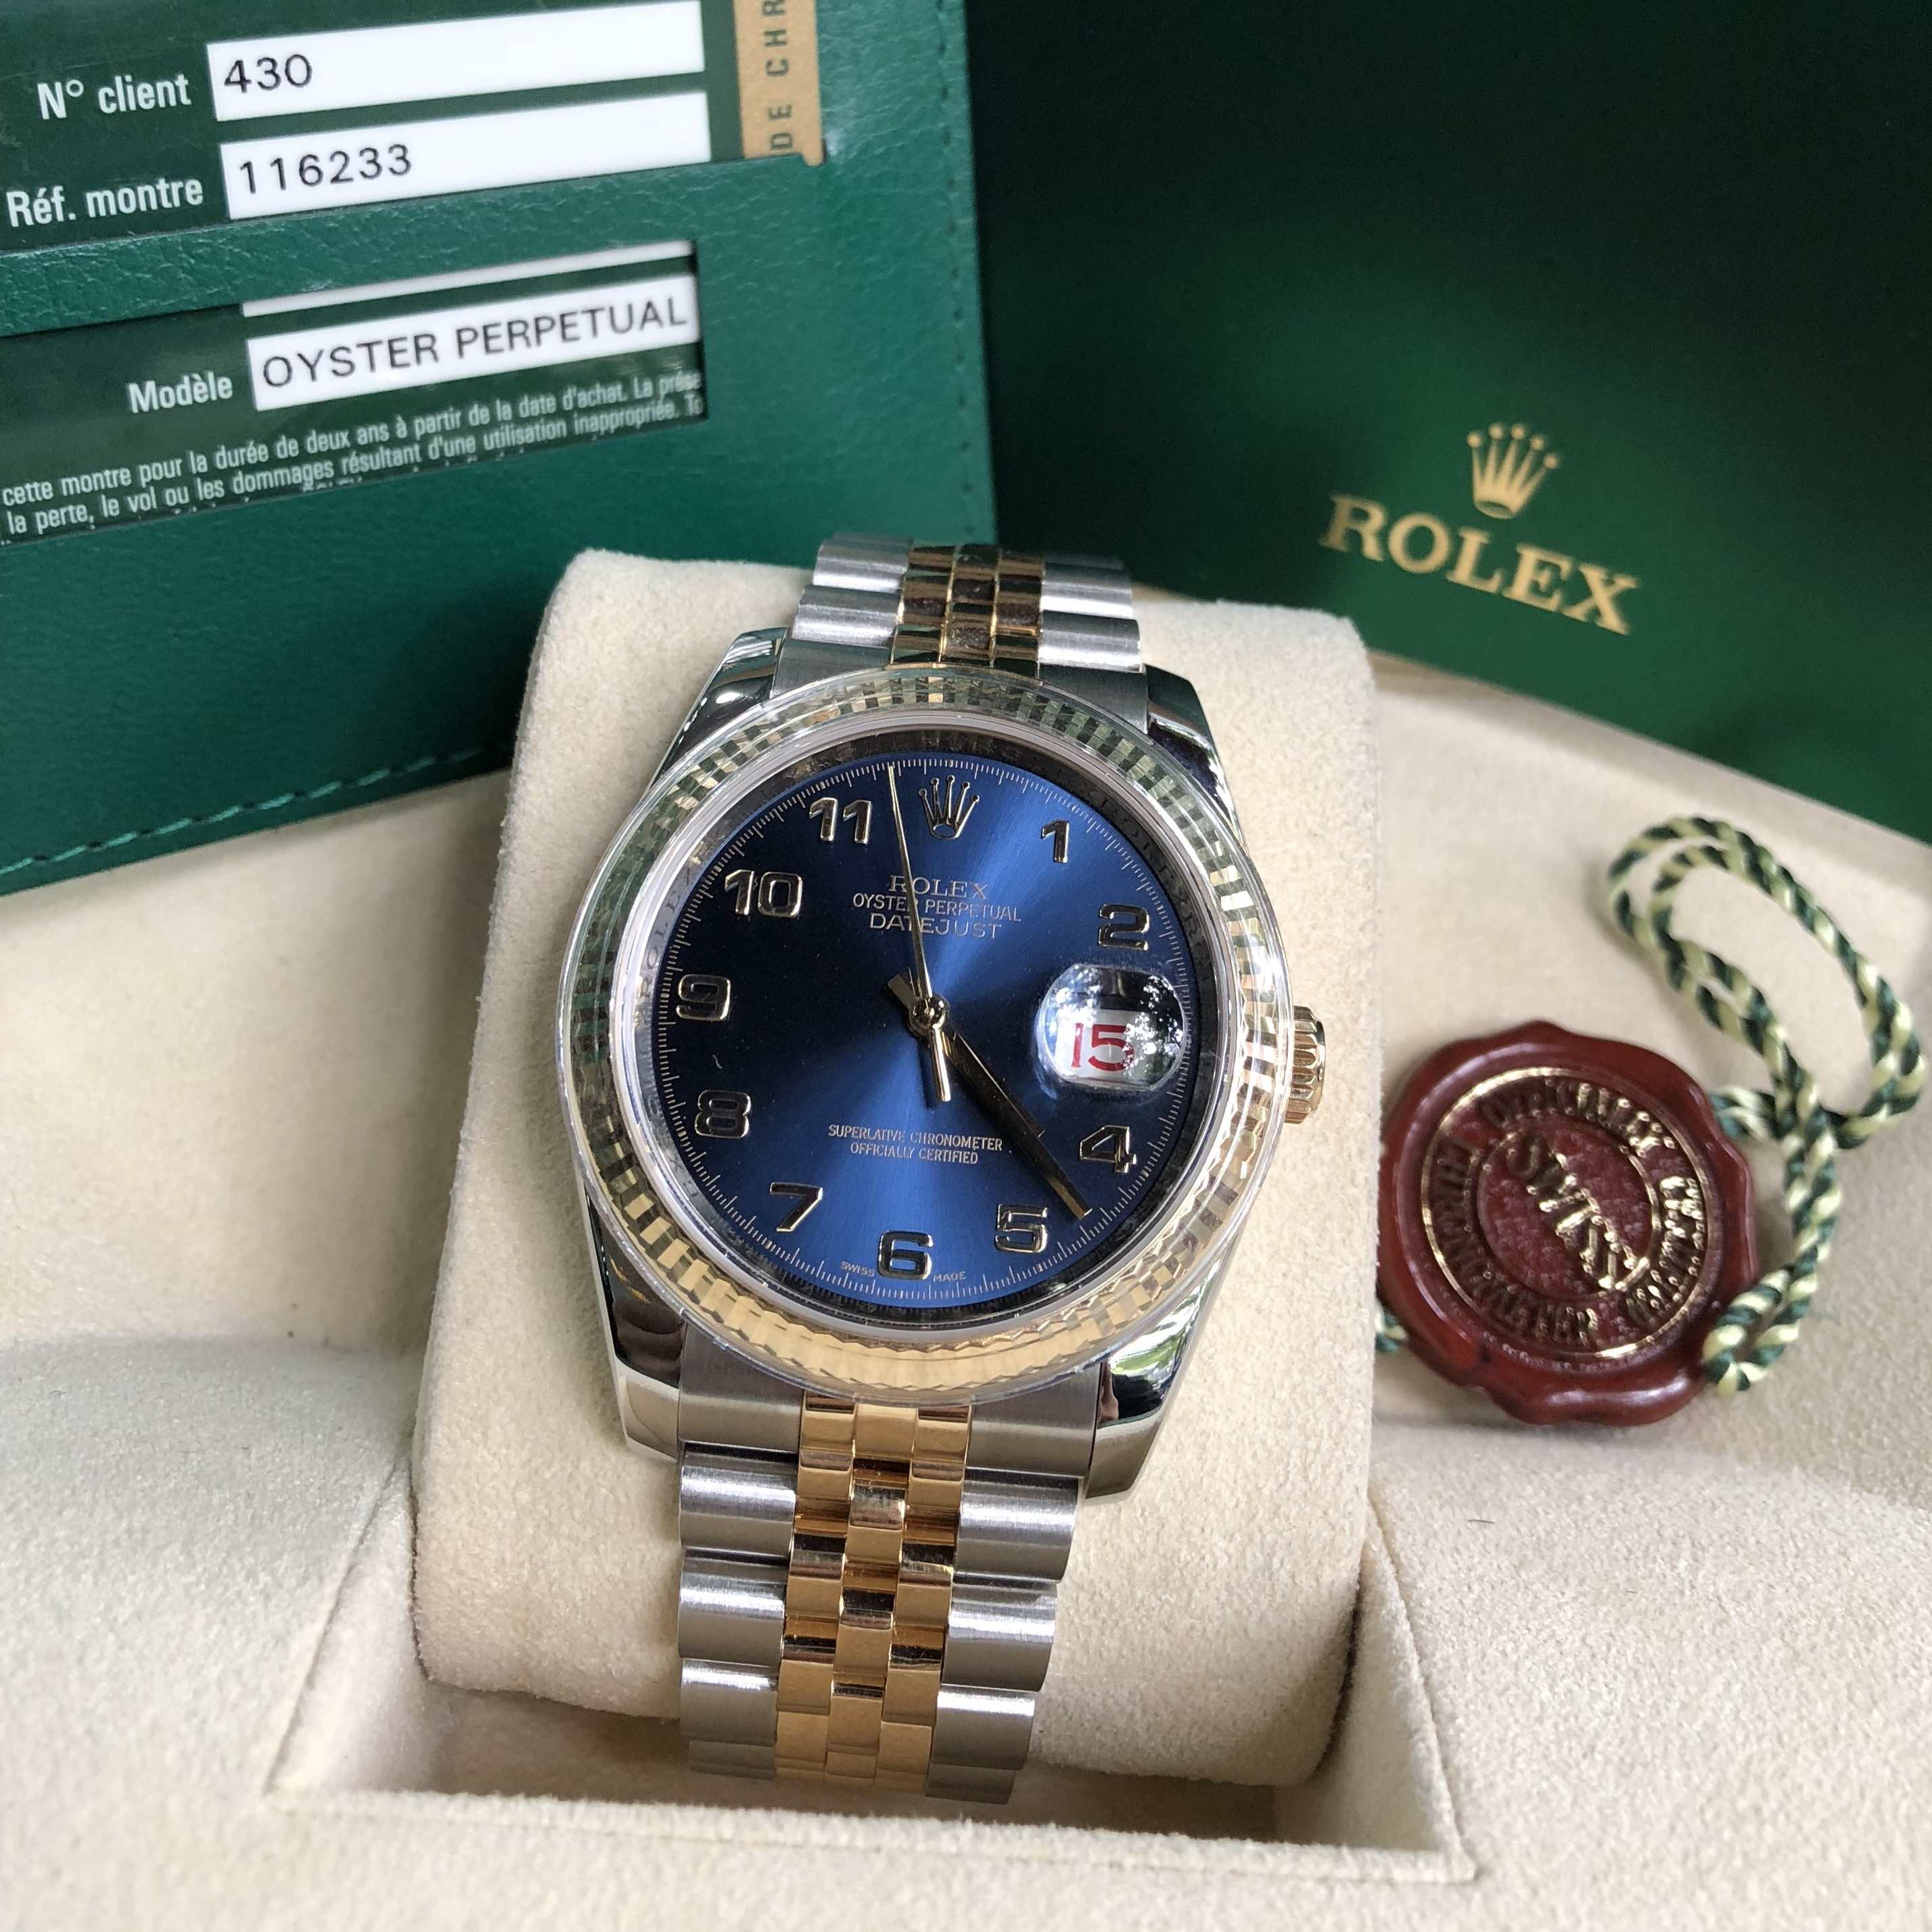 Rolex Datejust 36 Ref. 116233 mặt xanh Navy Demi 18k Fullbox